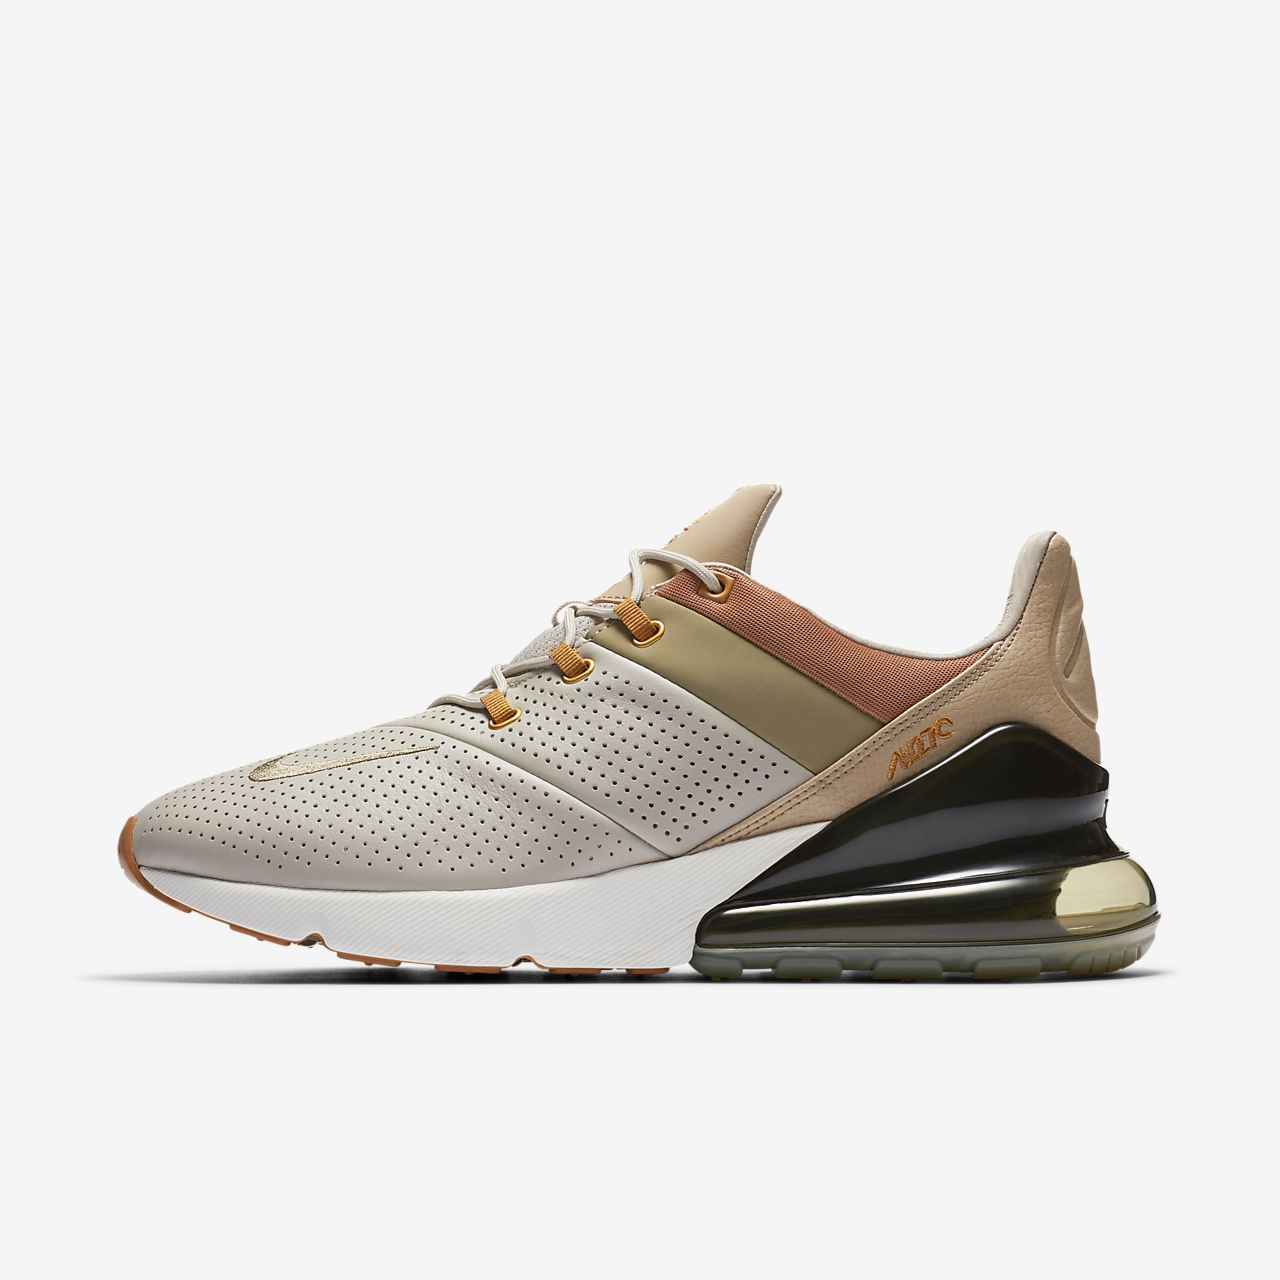 scarpe nike air max 270 uomo 2018